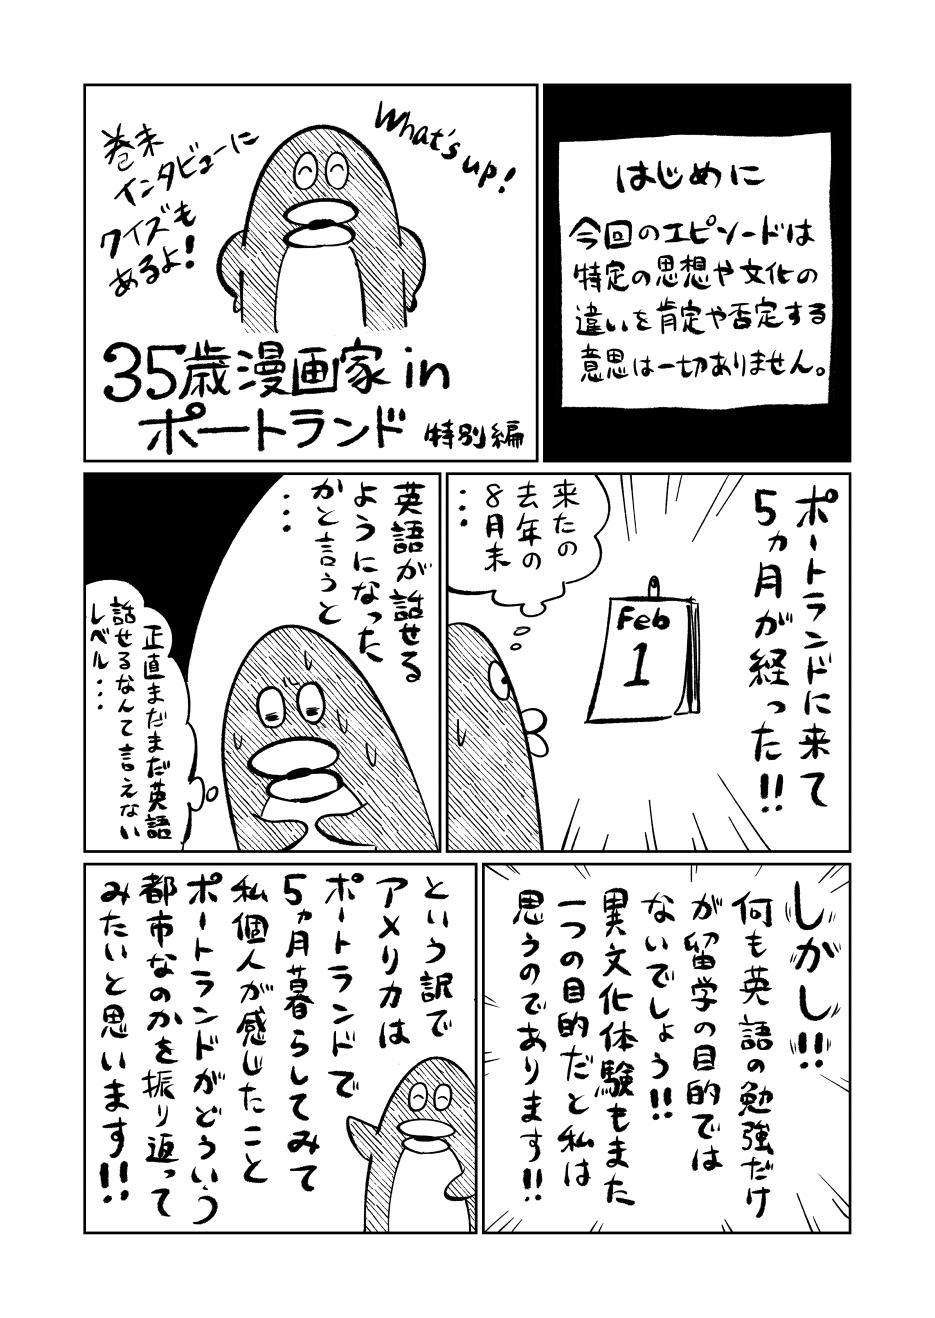 https://www.ryugaku.co.jp/blog/els_portland/upload/0a2d99ad7e30a78914fe7a5e5acb0440560d709f.jpg